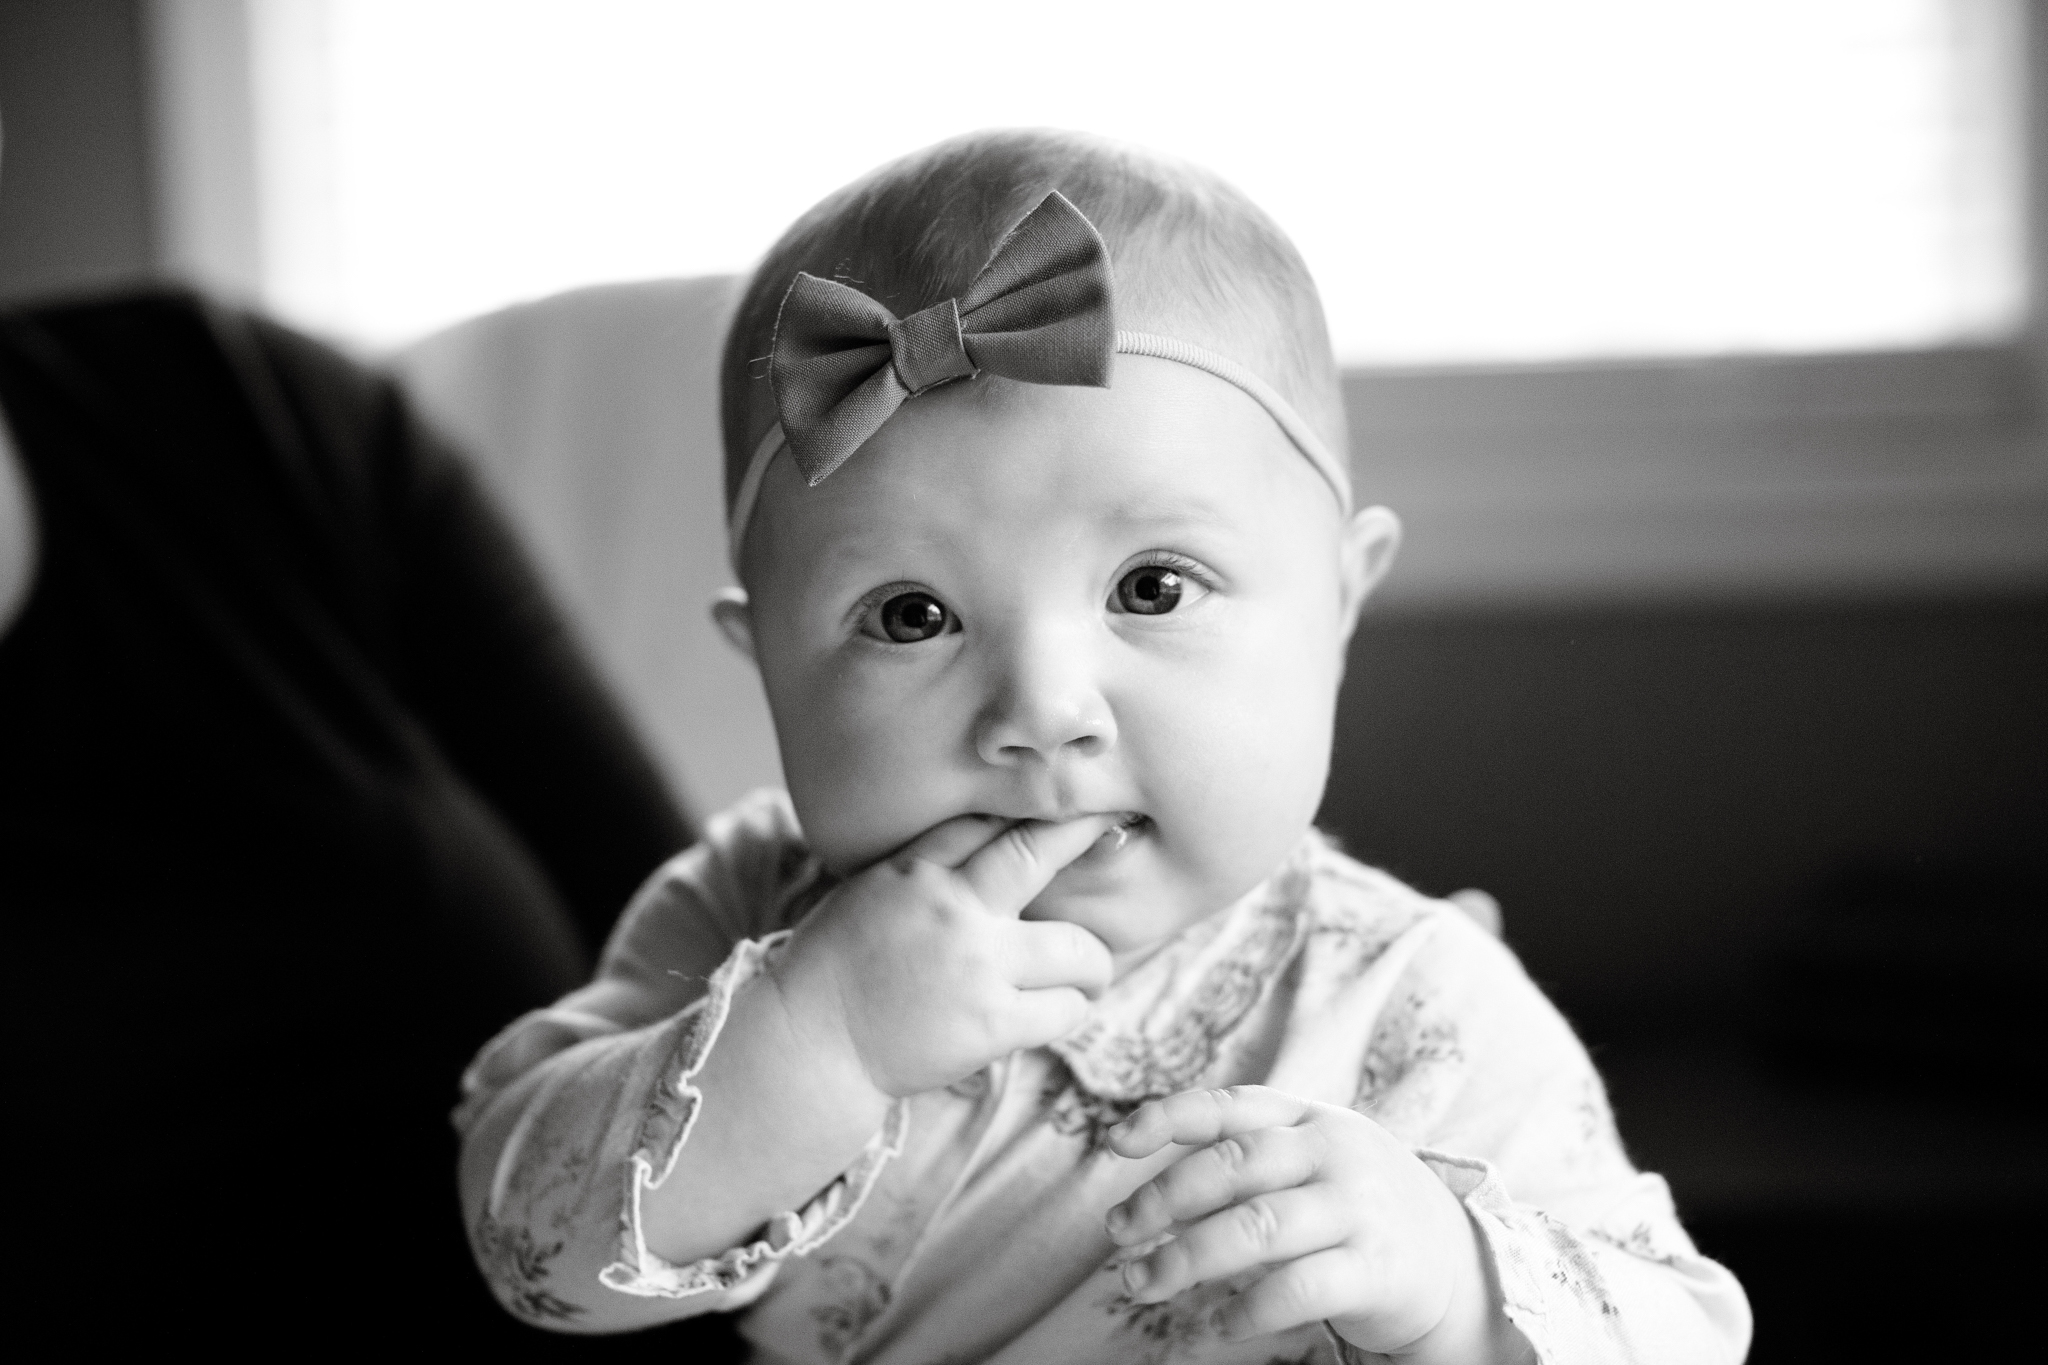 maine-baby-milestone-photographer-stepheney-collins-photography -13.jpg